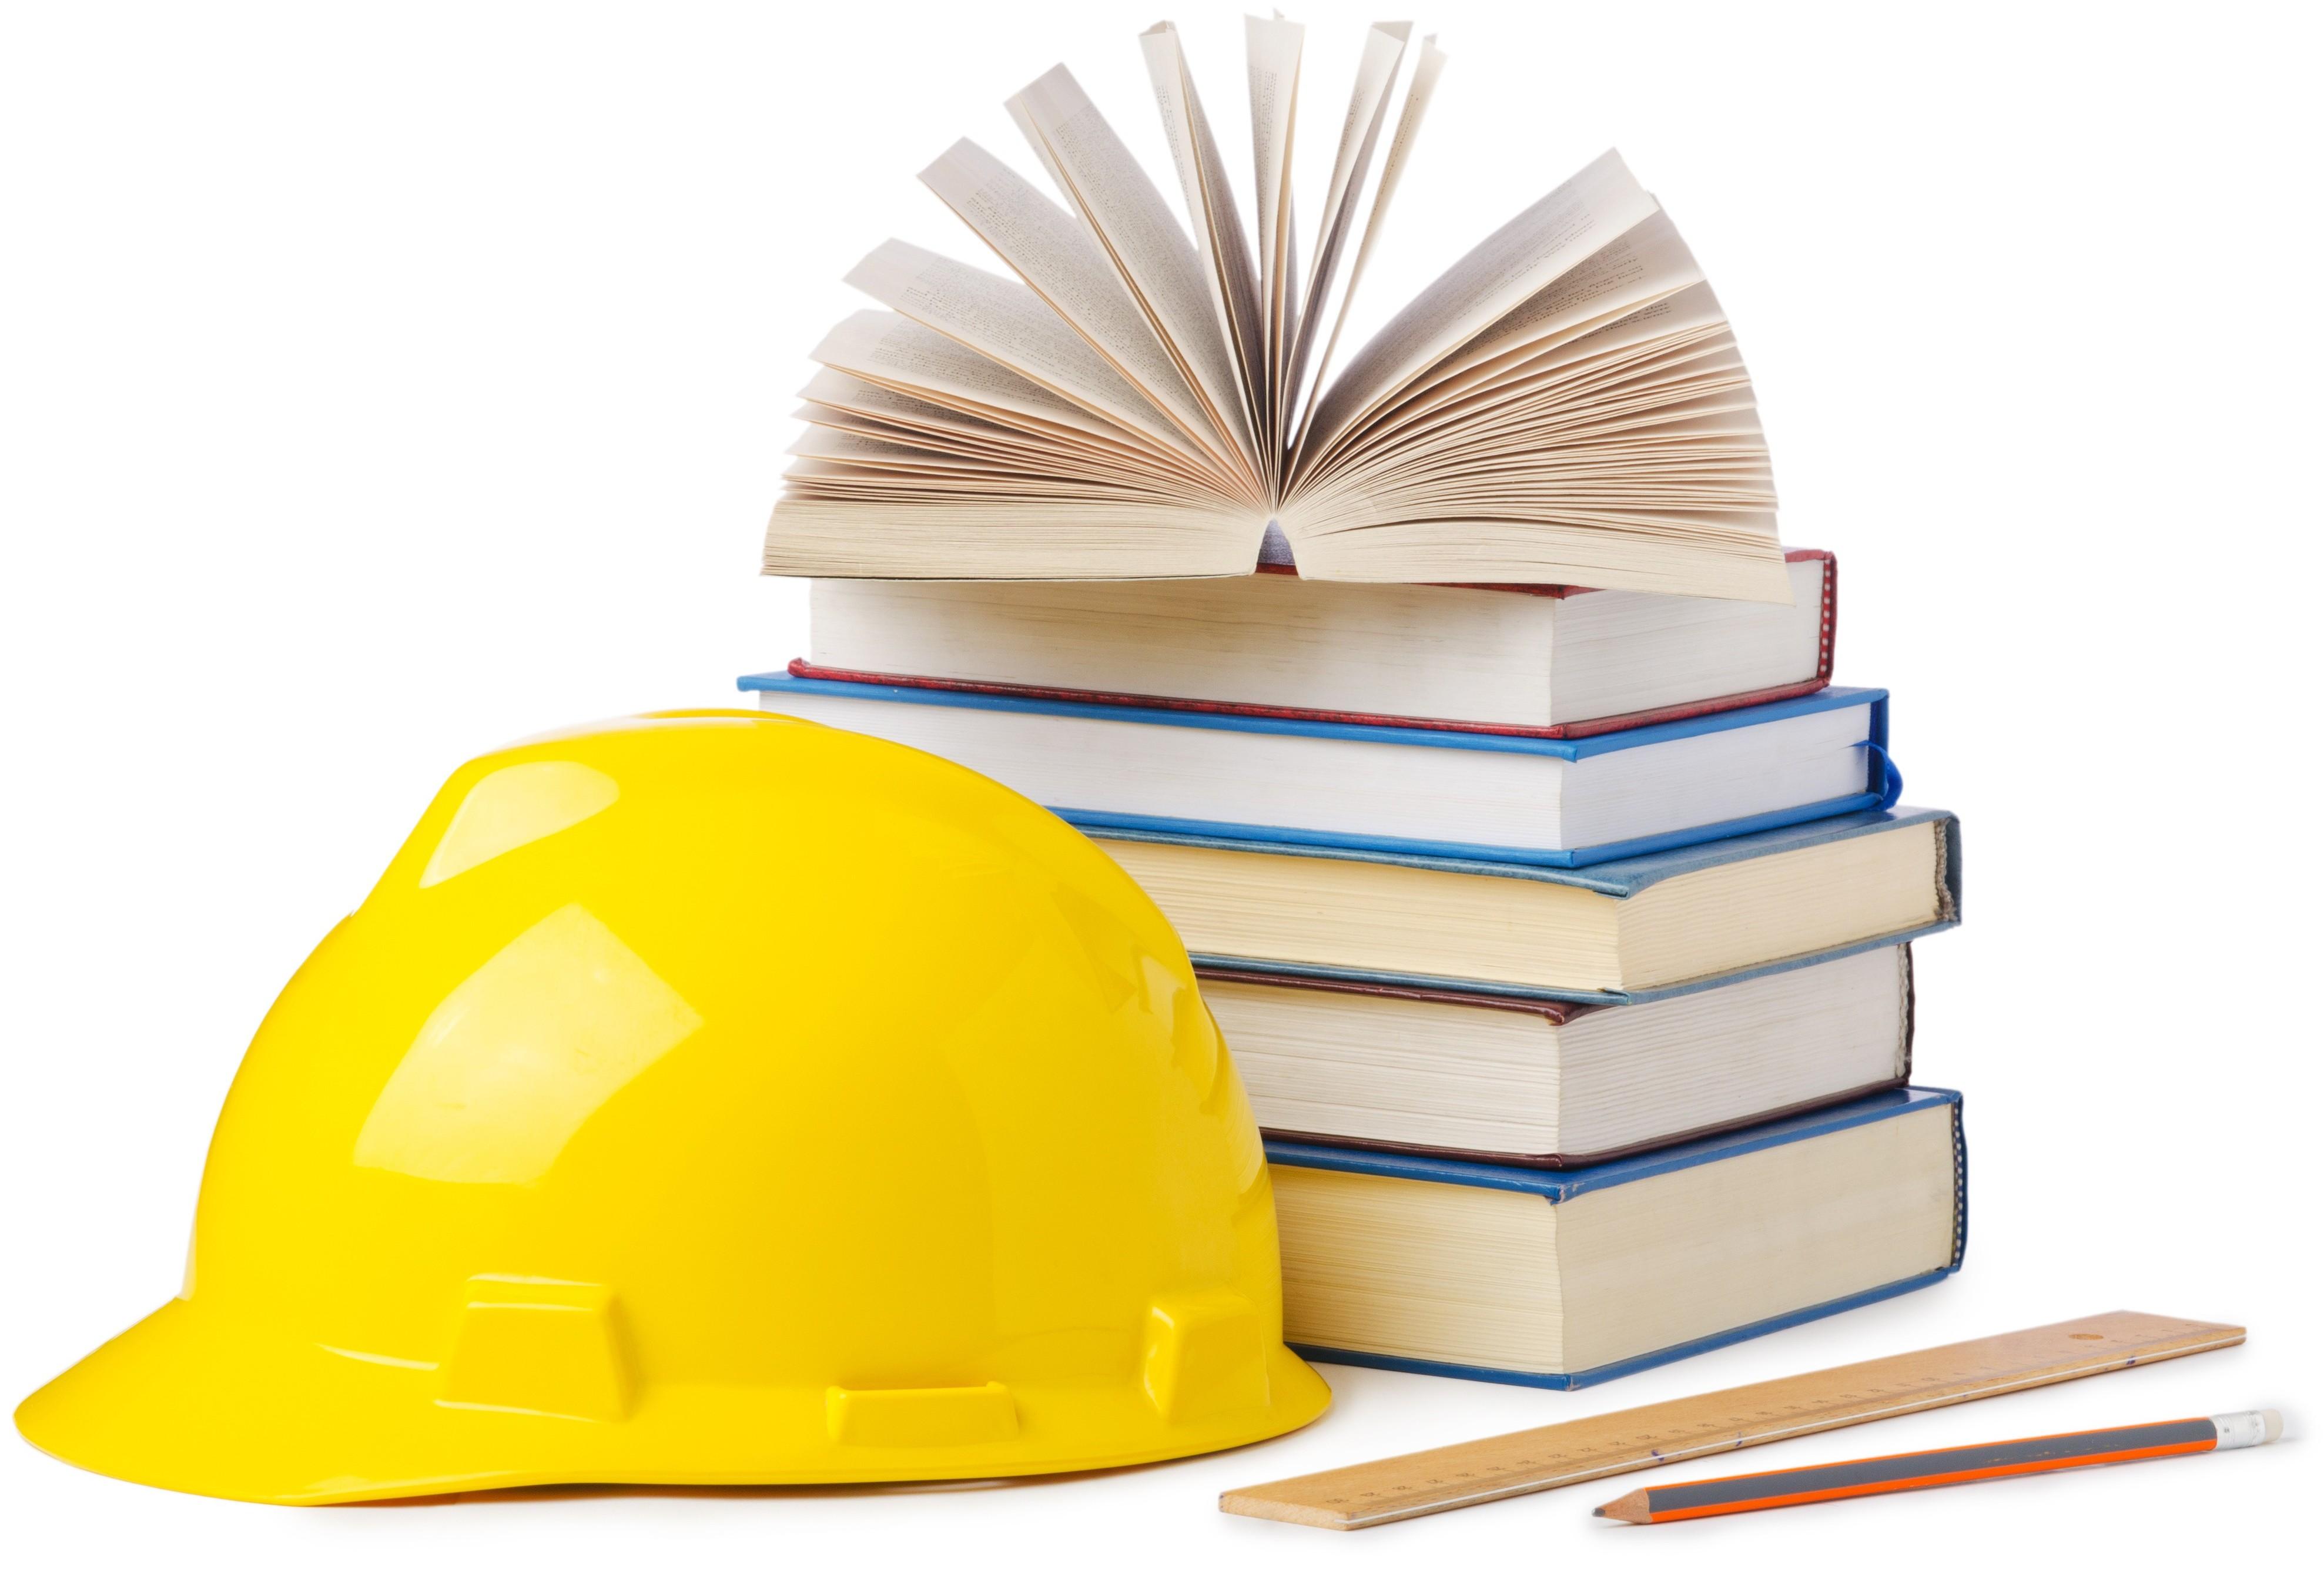 preparing for lean construction